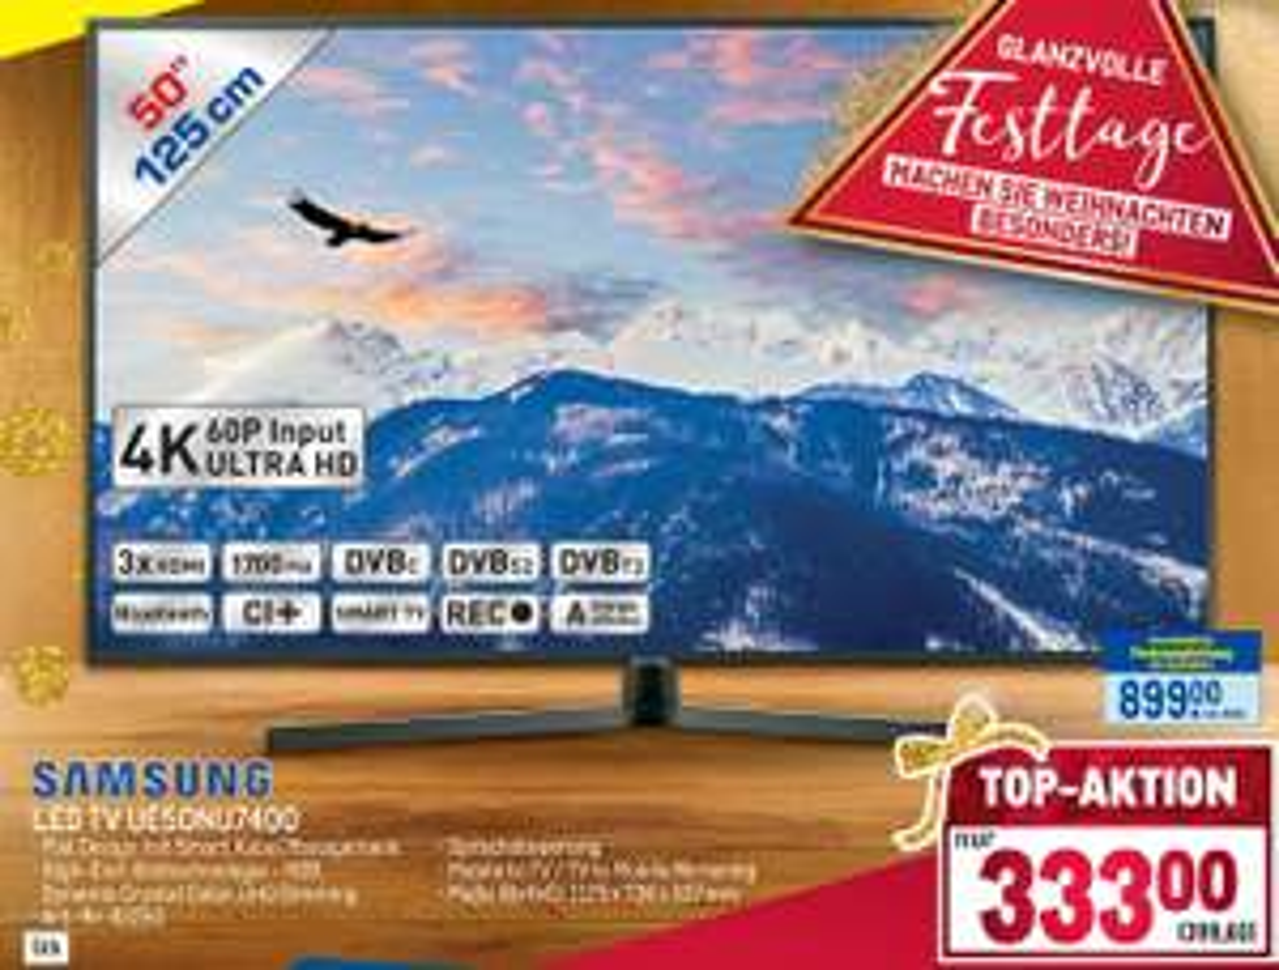 [METRO] SAMSUNG 4K LED TV UE50NU7400 um 399,60€ (BESTPREIS !!!)